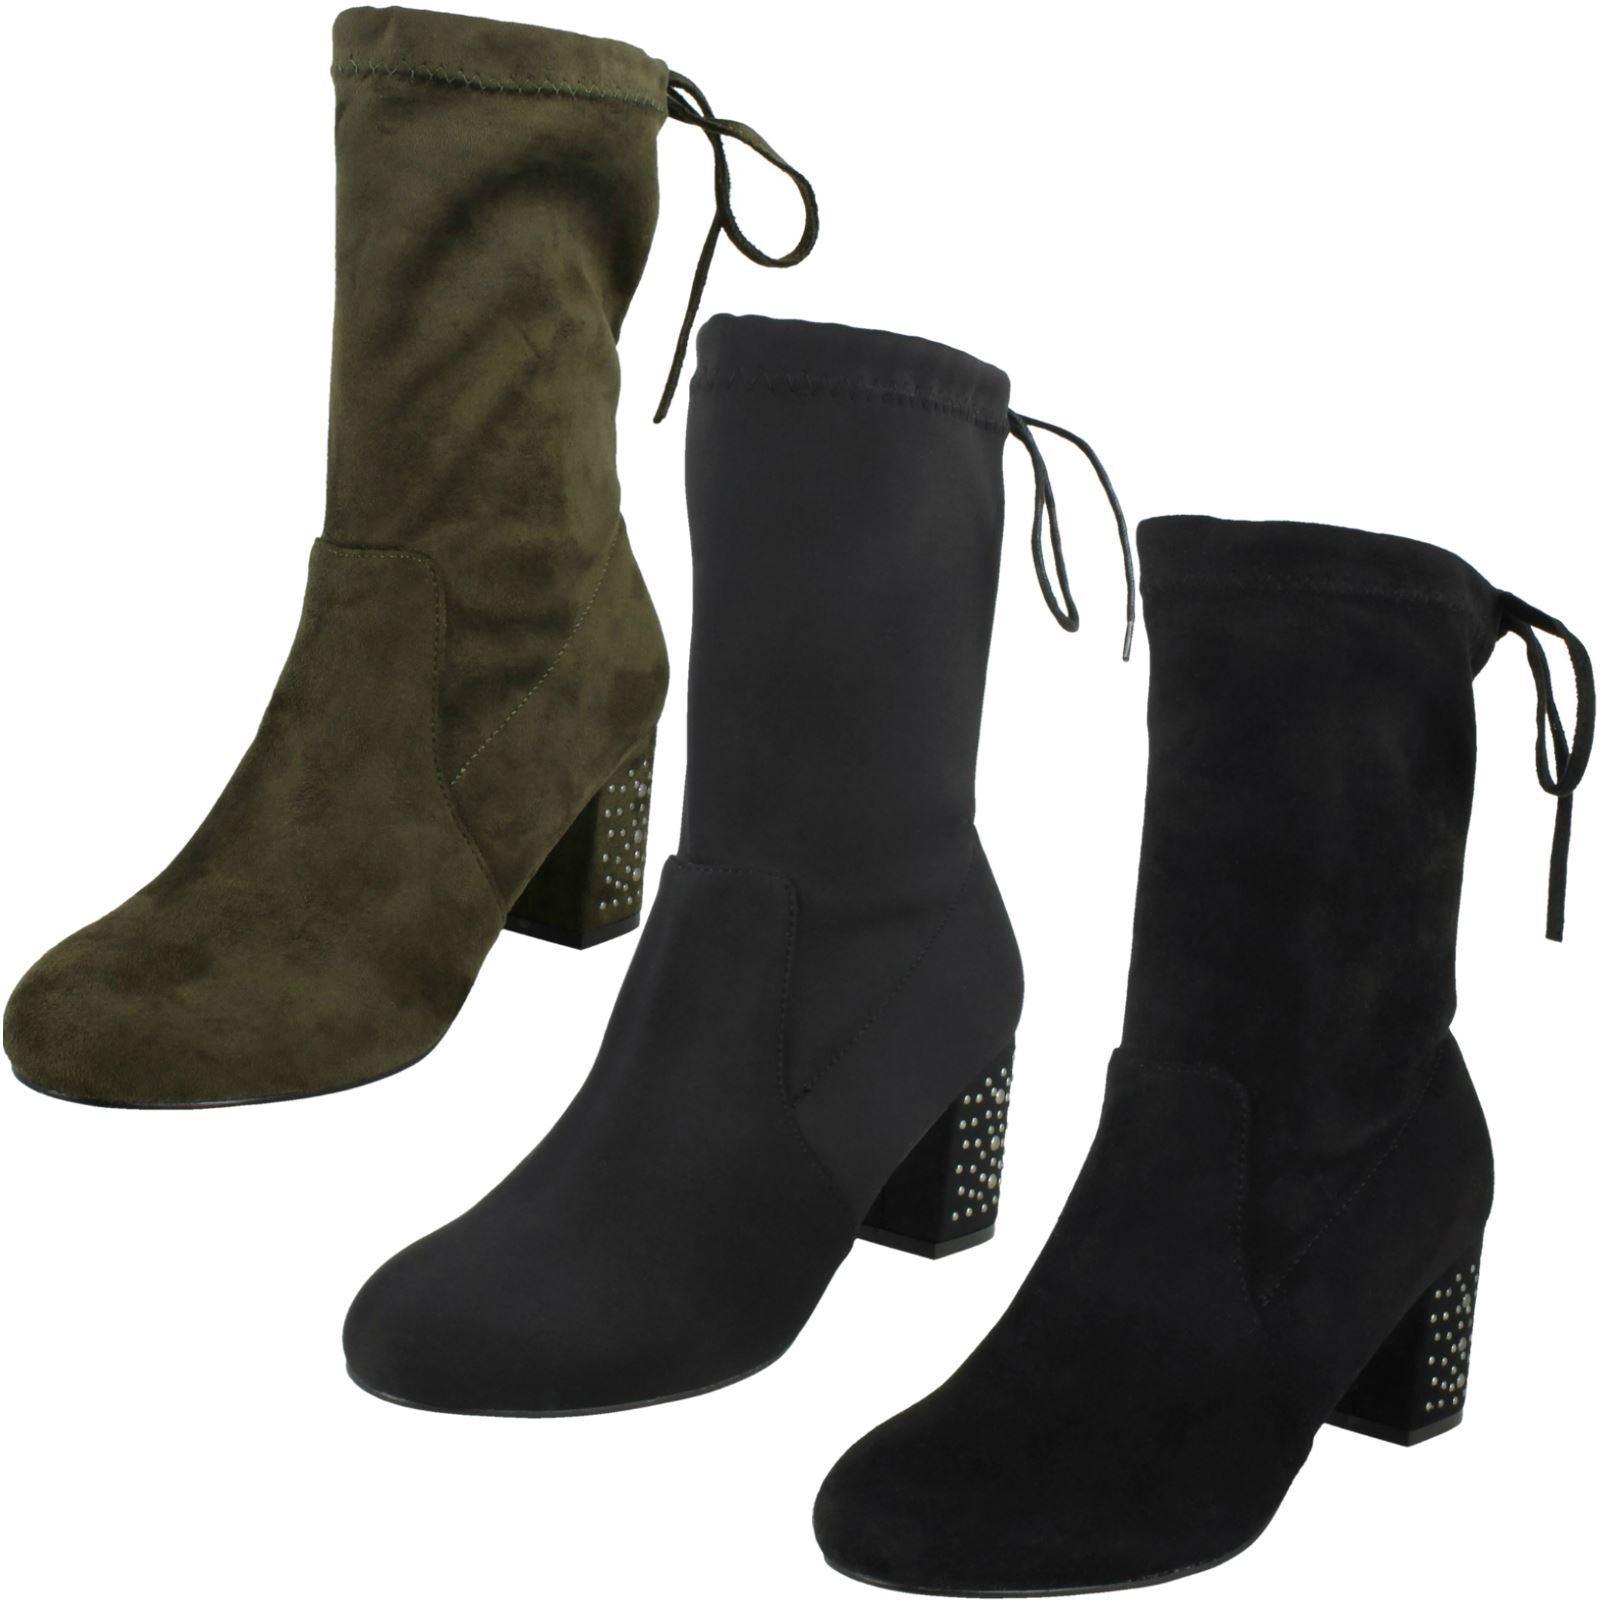 Ladies Spot On Mid Chunky Heel Calf High Boots